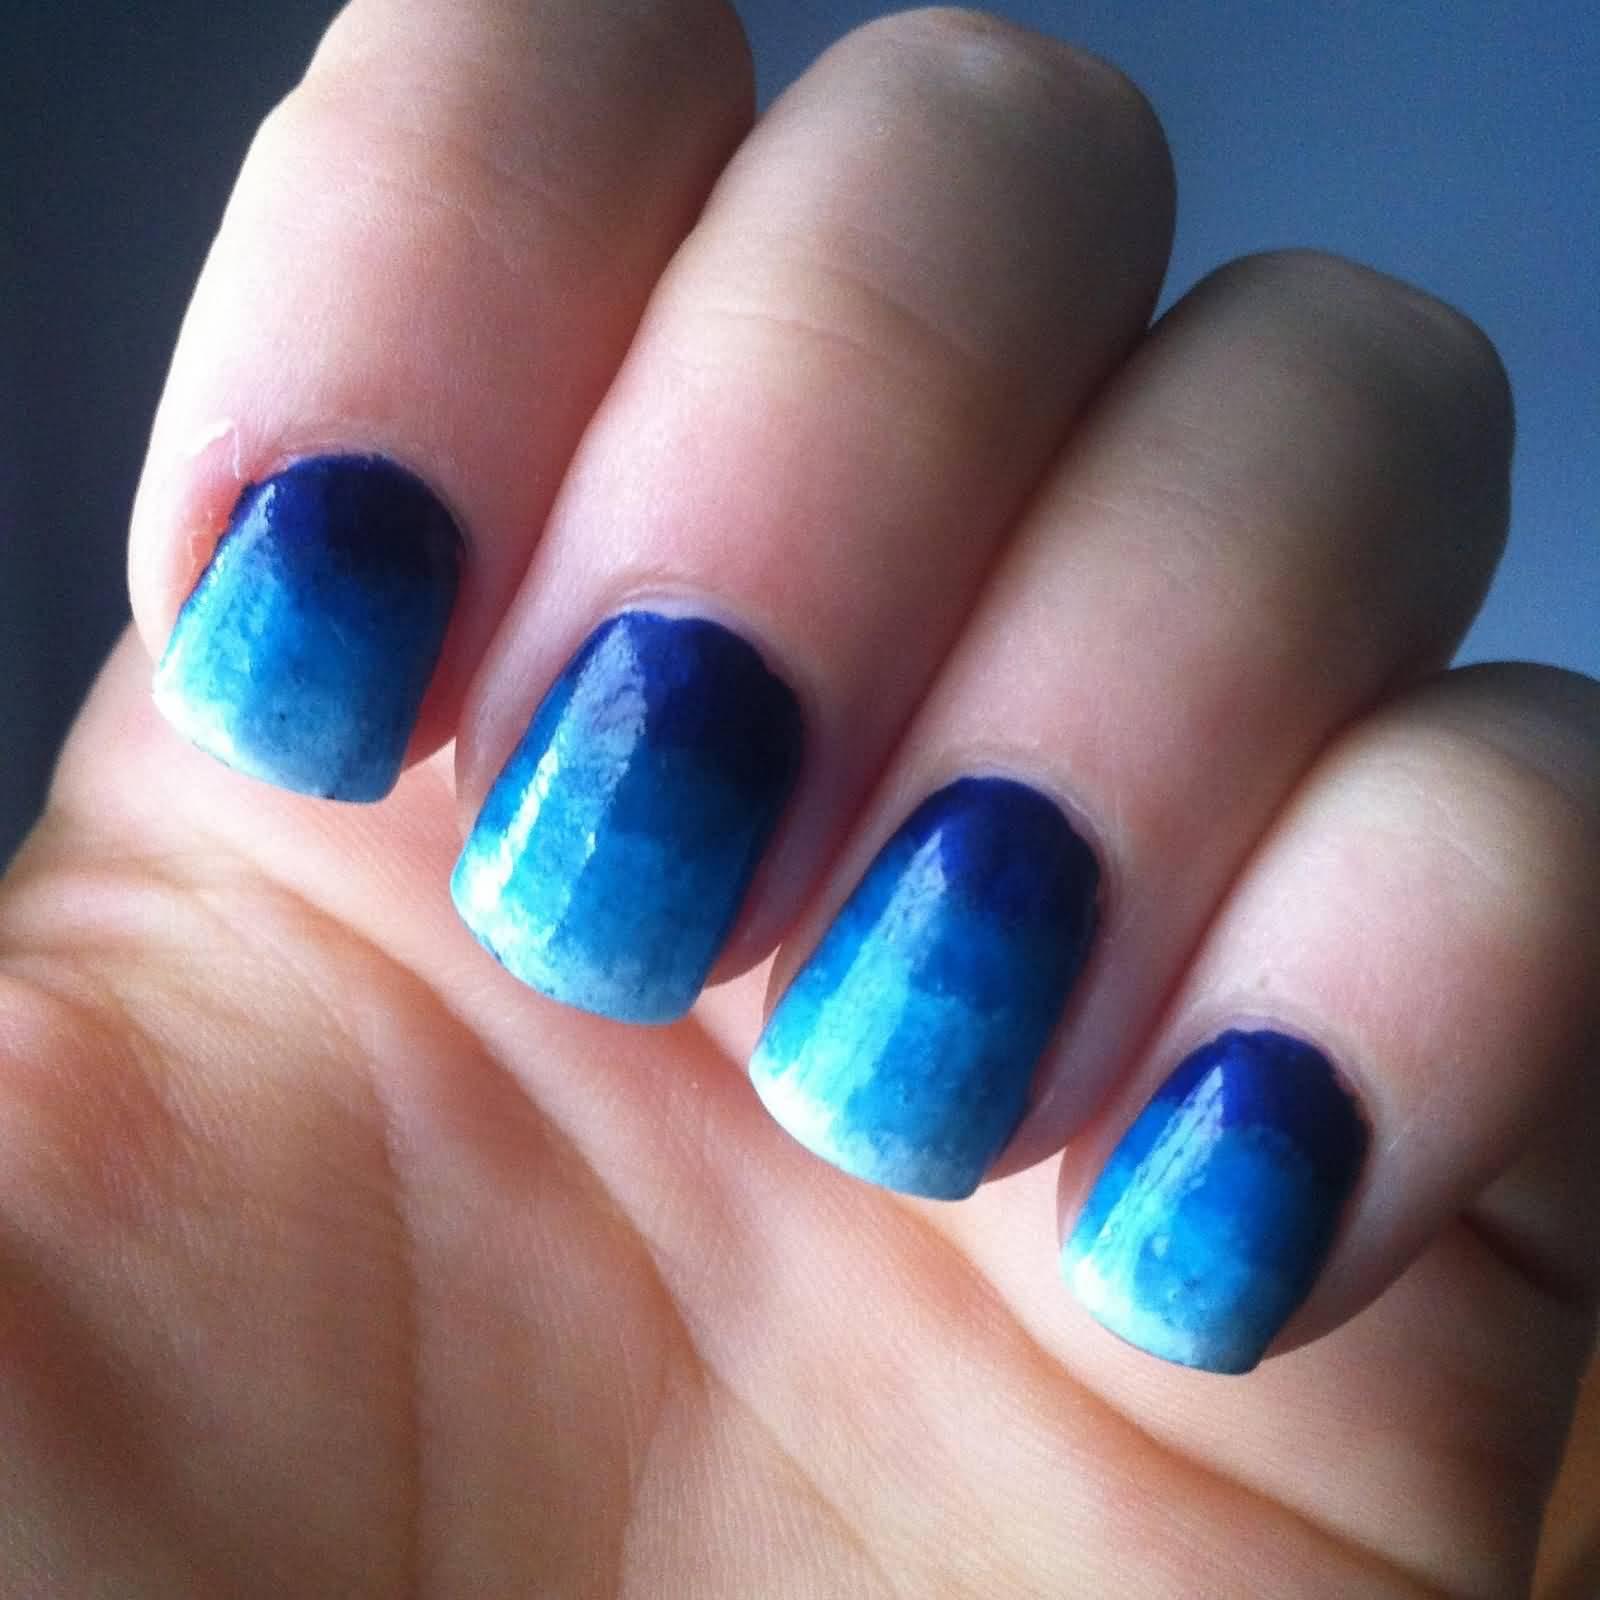 Nail Art Images Blue: 50+ Best Blue Nail Art Design Ideas